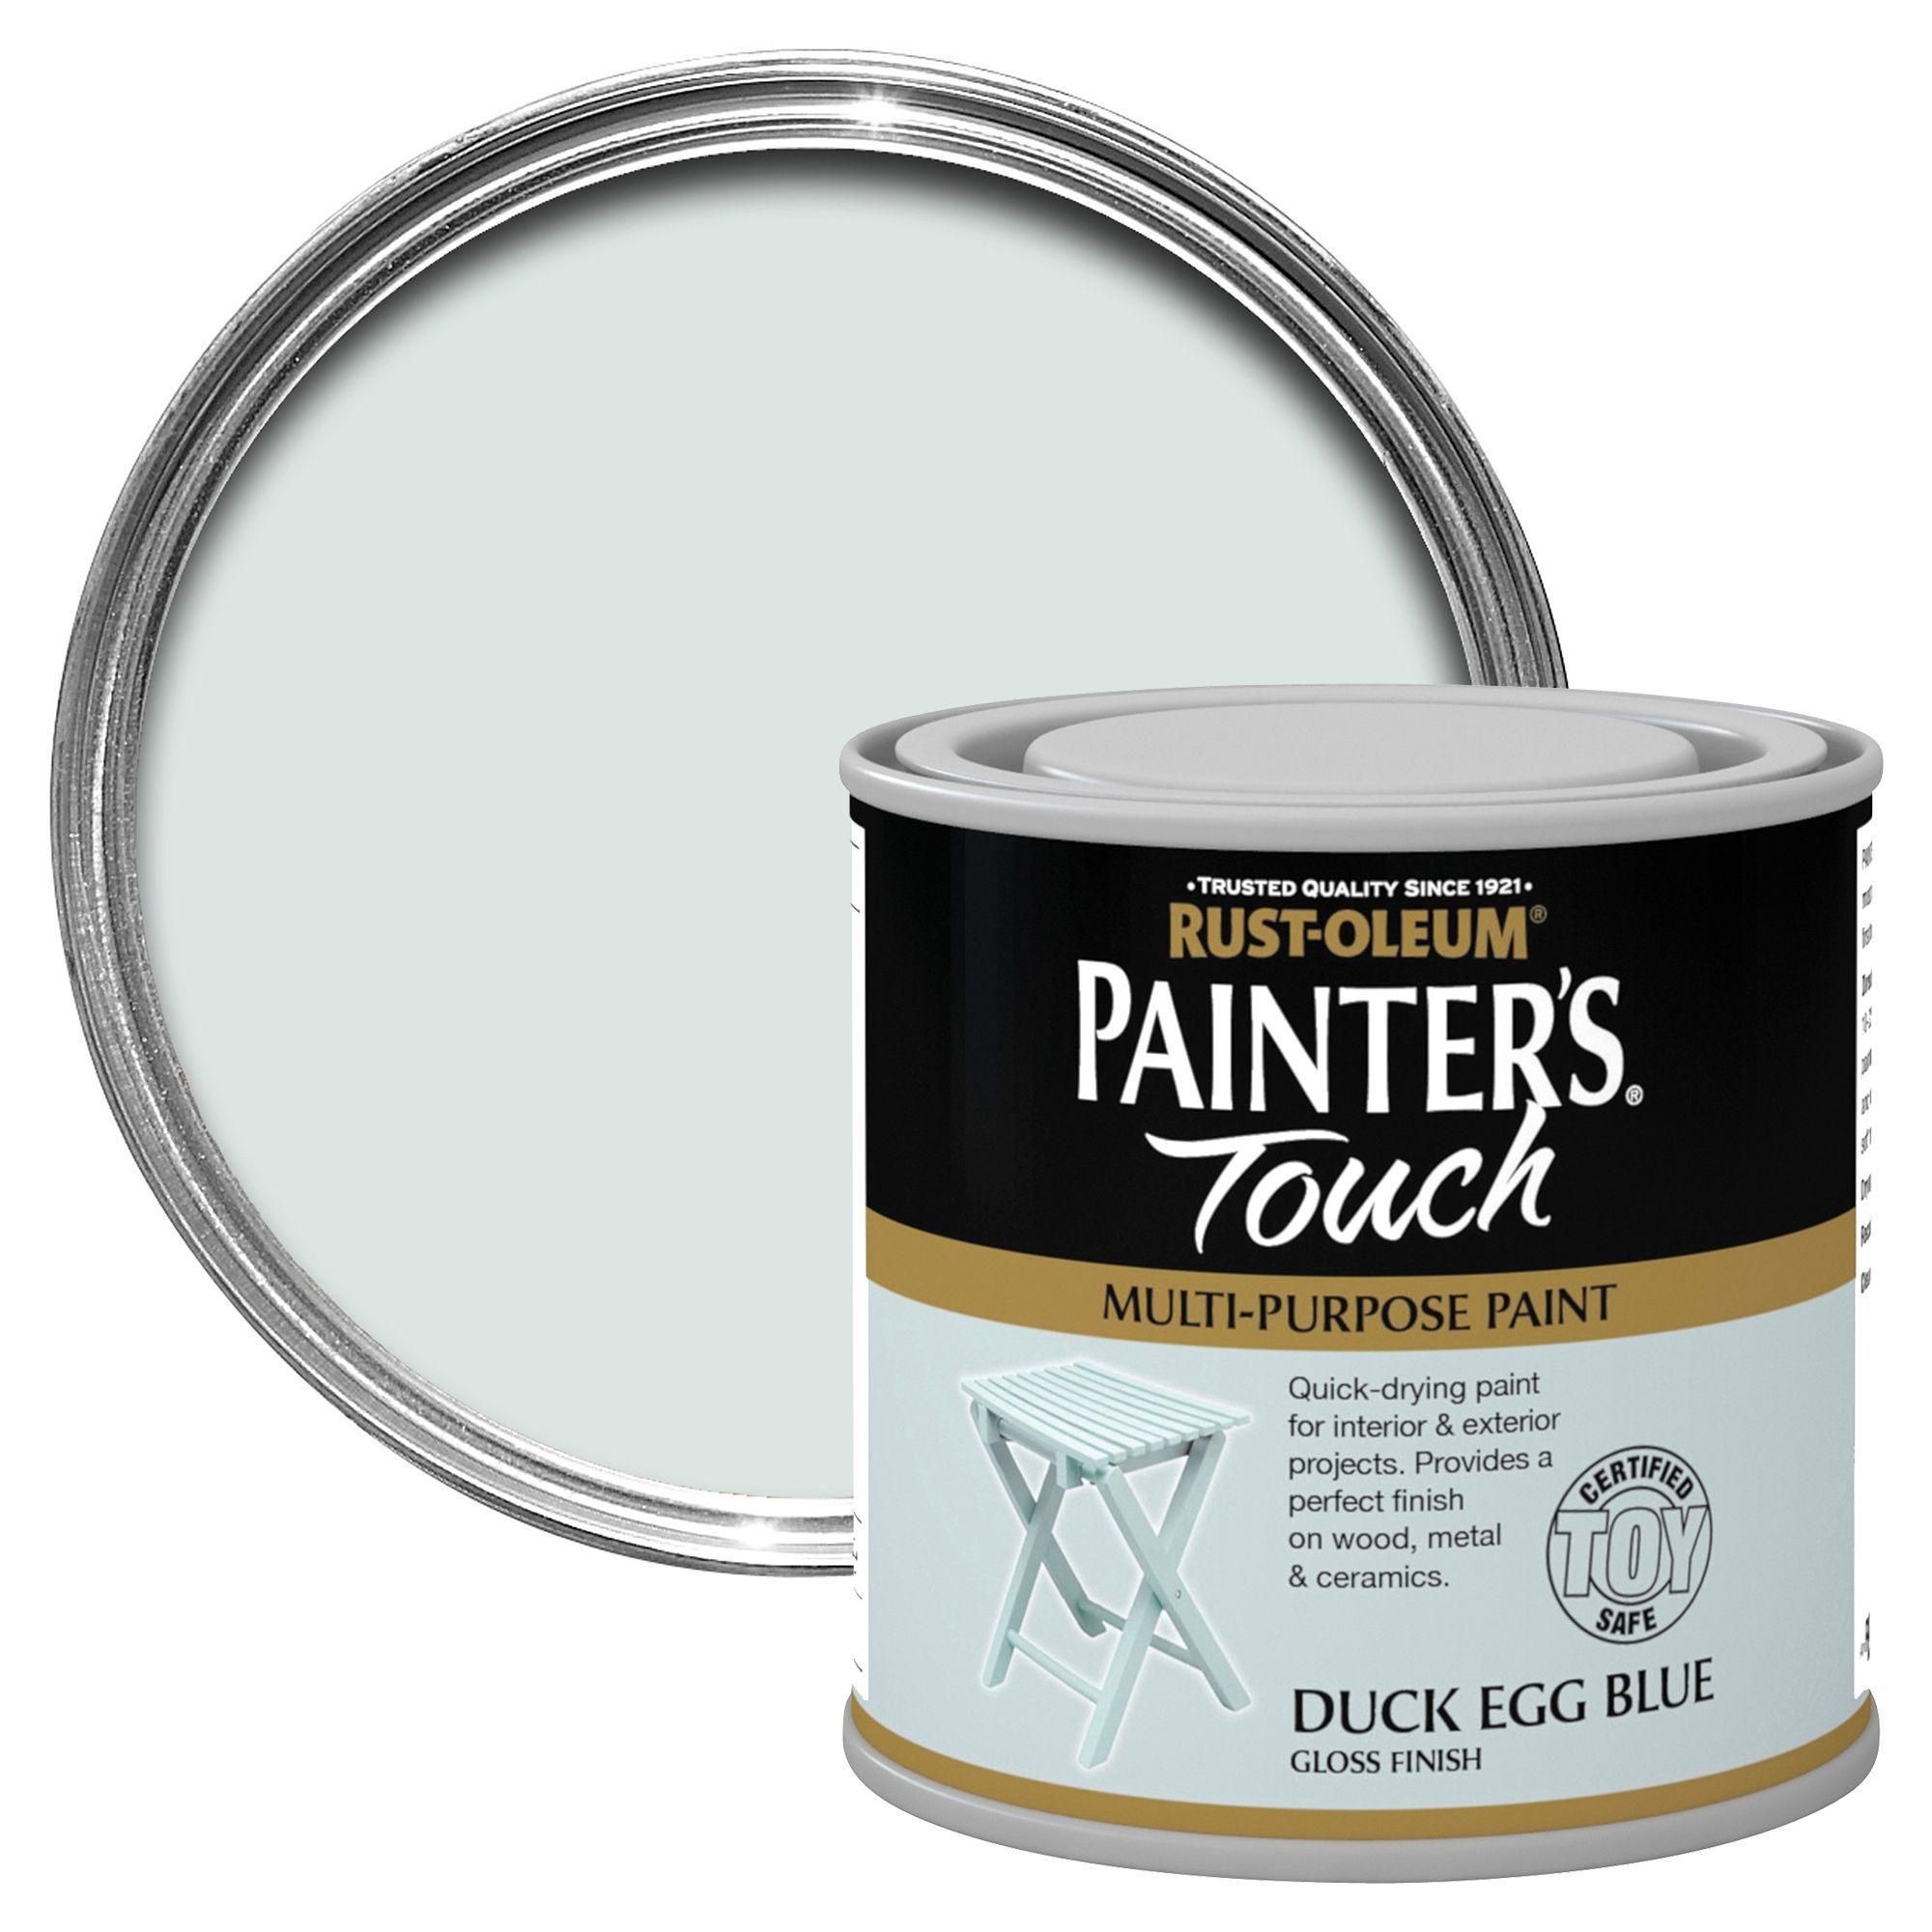 Rust-oleum Painter's Touch Interior & Exterior Duck Egg Blue Gloss Multipurpose Paint 250ml